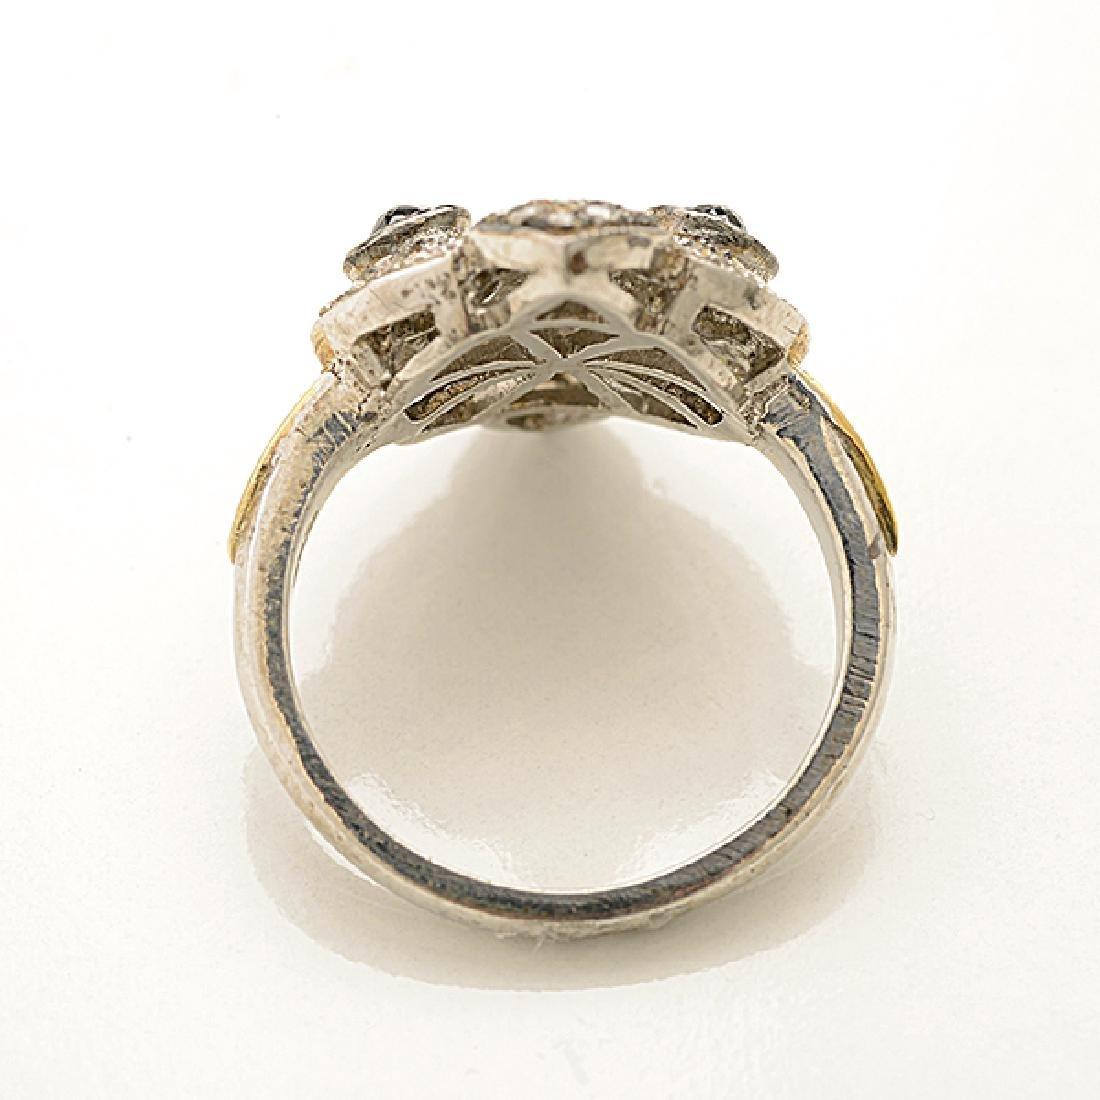 Diamond, Silver, 14k Yellow Gold Ring. - 3